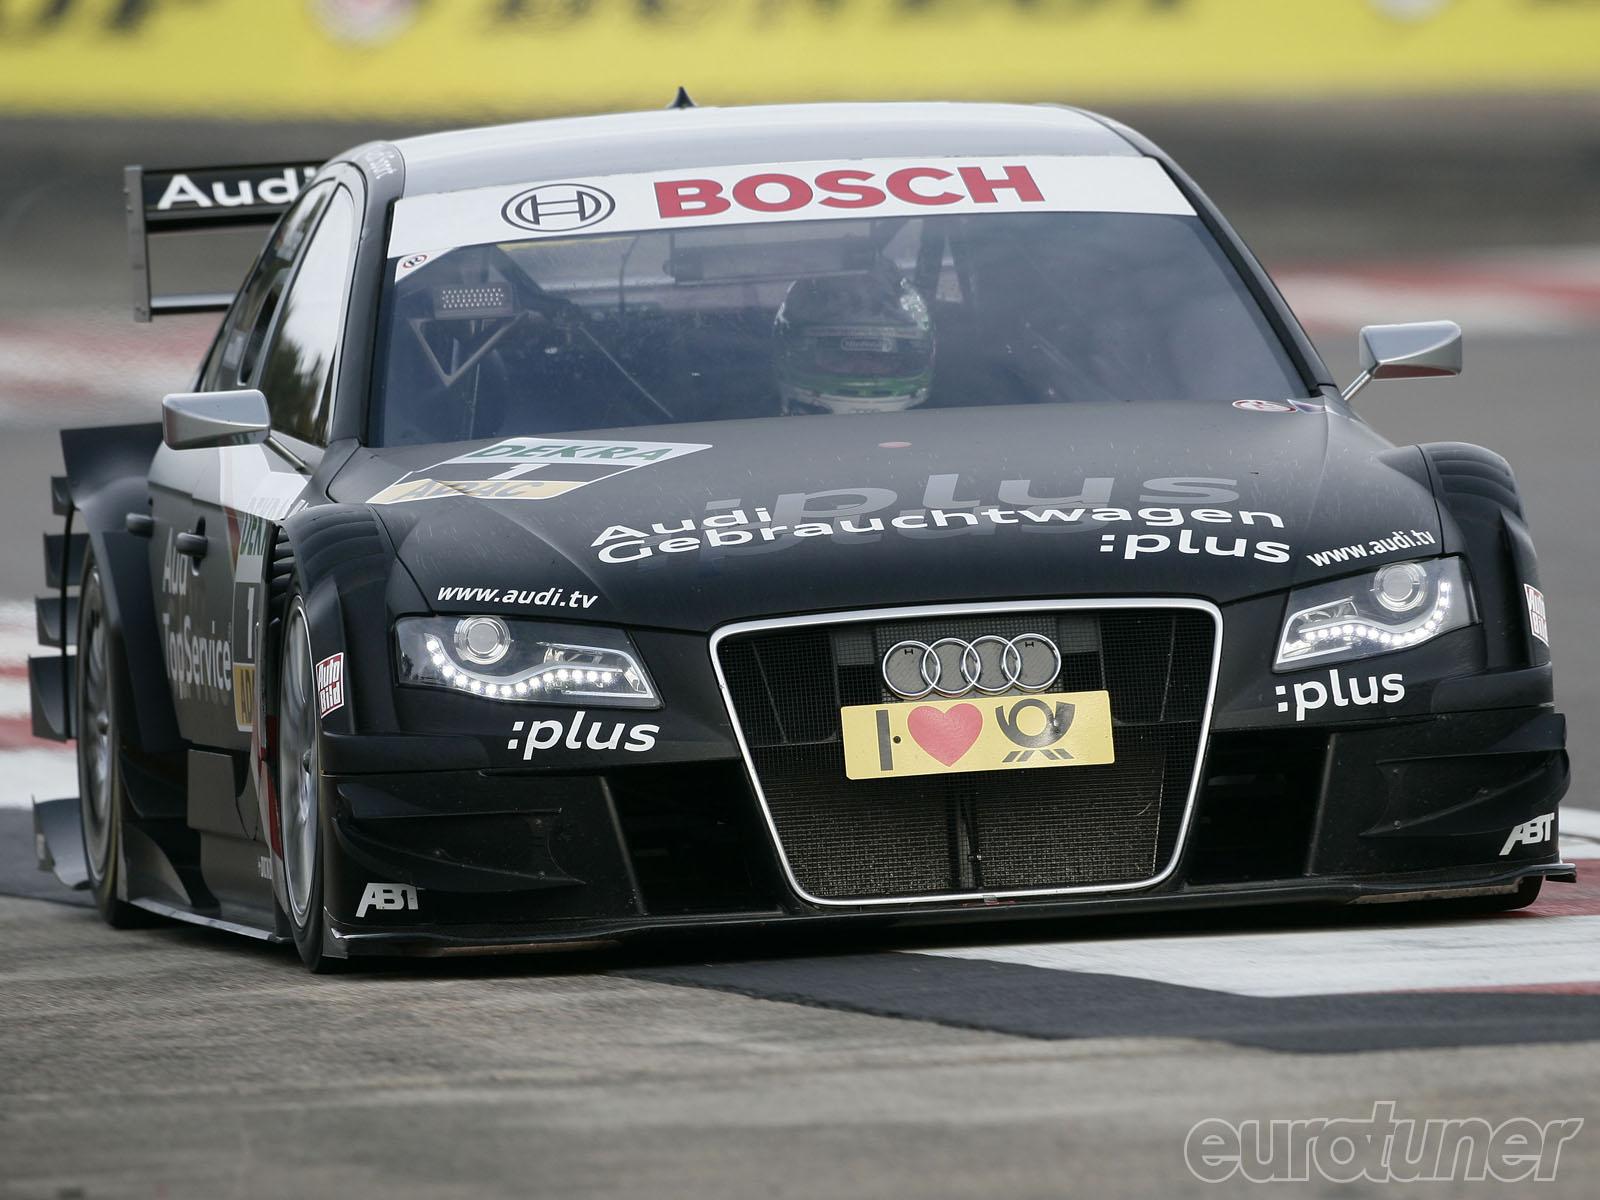 http://3.bp.blogspot.com/_ydzDaMFMYz8/TTs7rru3TBI/AAAAAAAAARQ/FfQTJOdoRyE/s1600/Black-Custom-Audi-A4-DTM-Sport-Racing-Car-Design.jpg